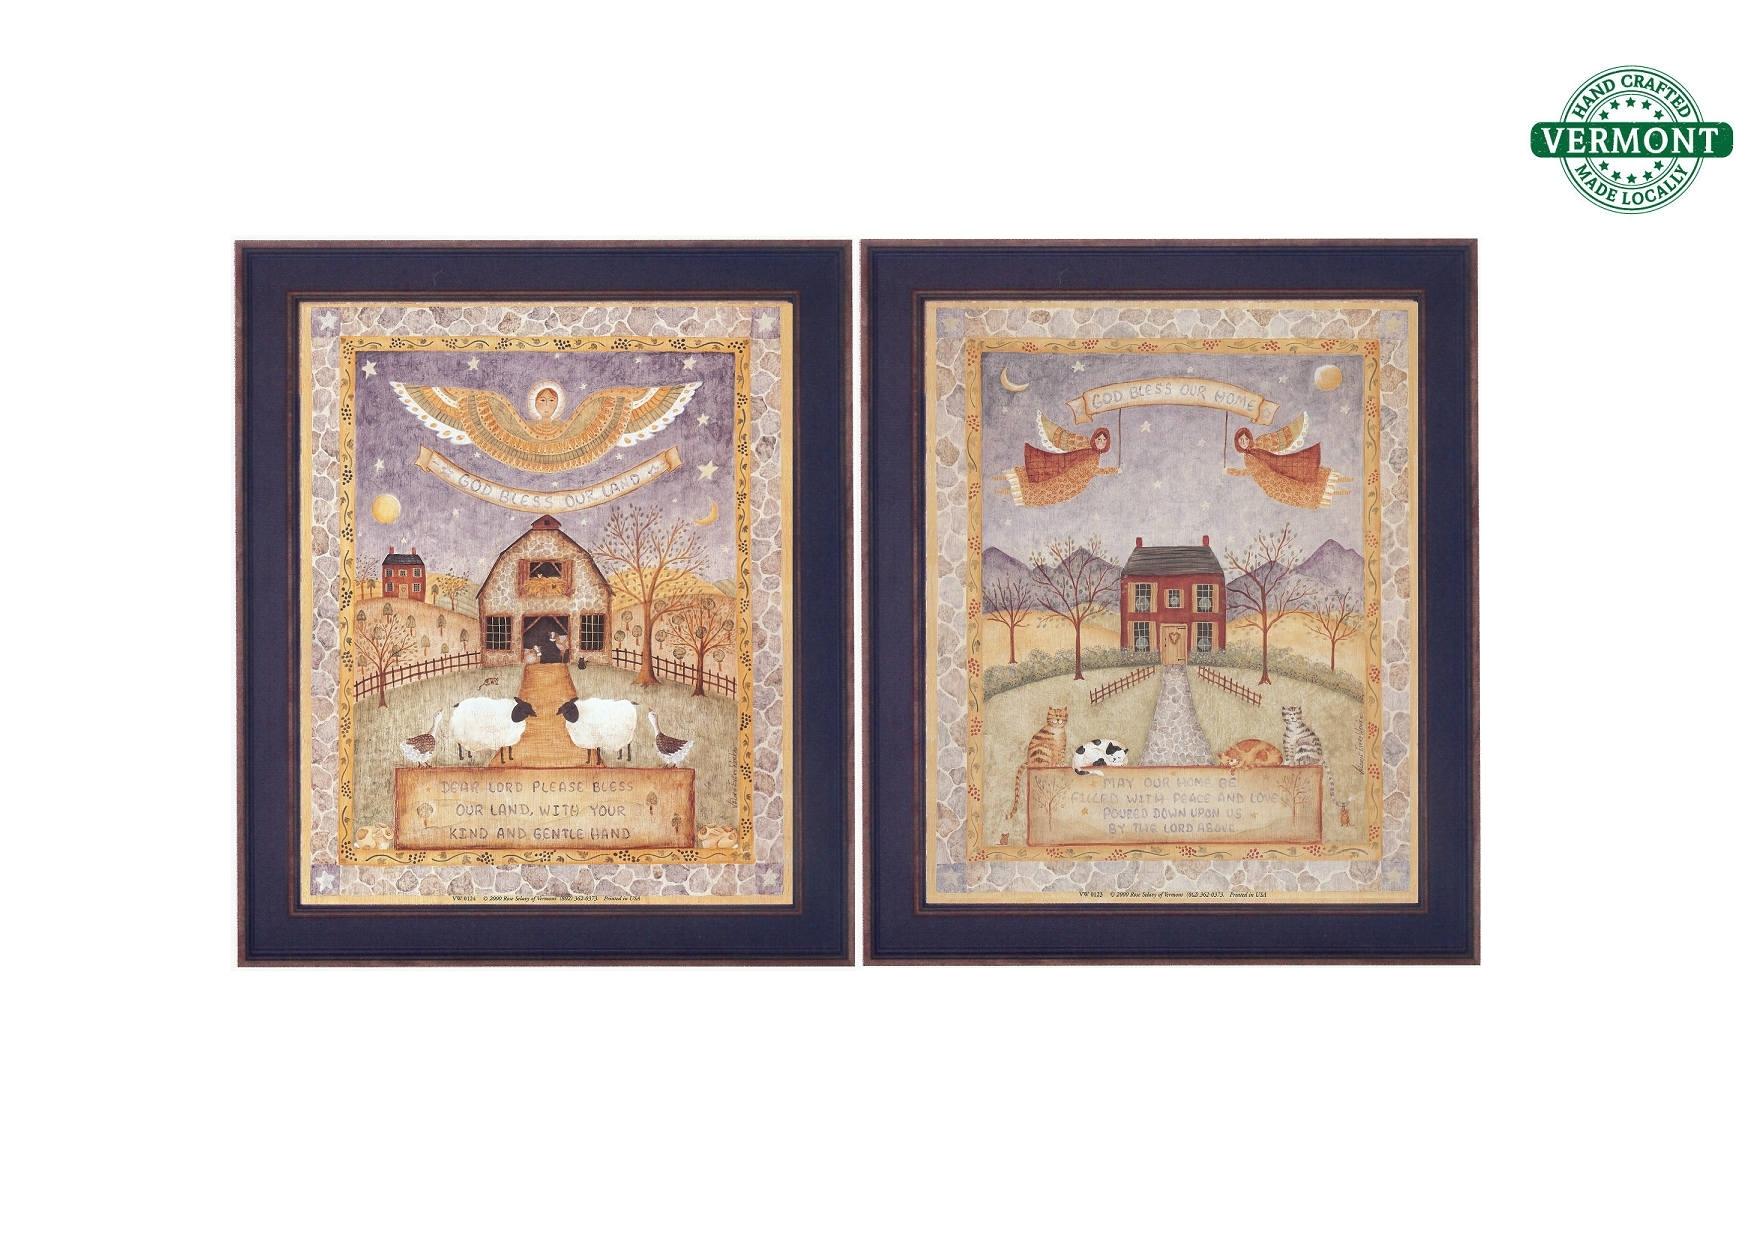 Set Of 2 Vintage Framed Folk Art Prints God Bless Our Home With Regard To Best And Newest Framed Folk Art Prints (View 6 of 15)